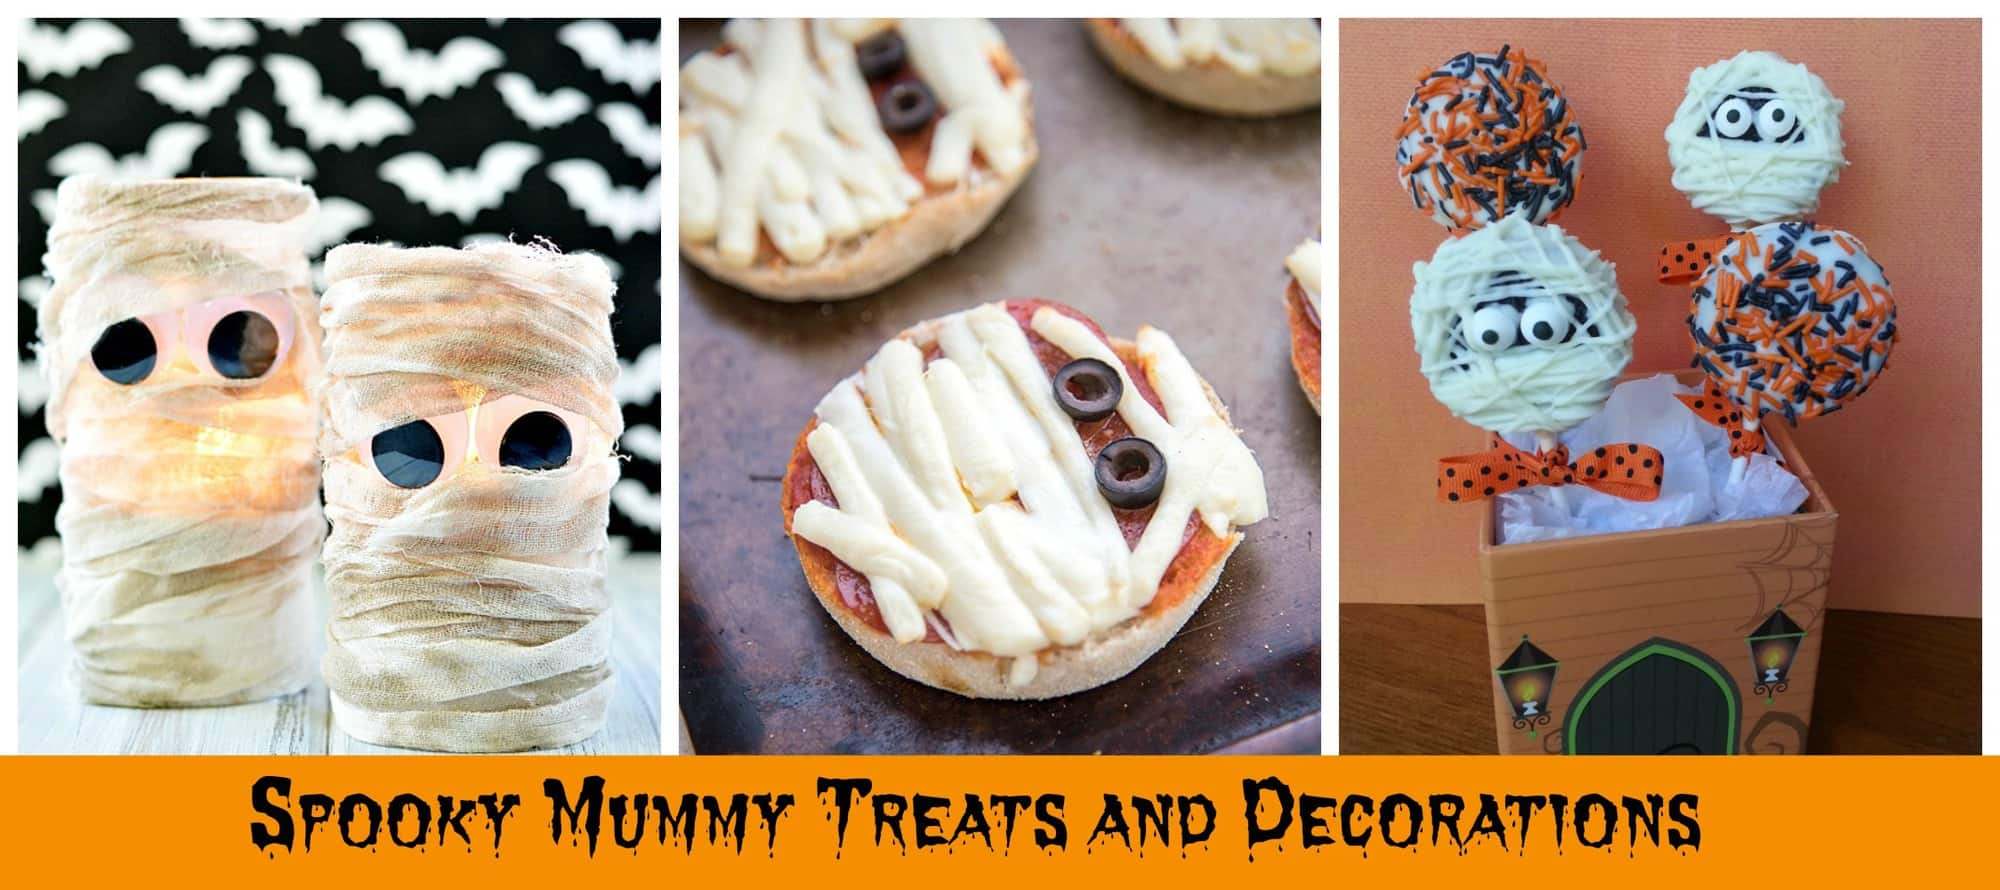 15+ Halloween Ideas – Silly & Spooky Mummy Treats and Decorations